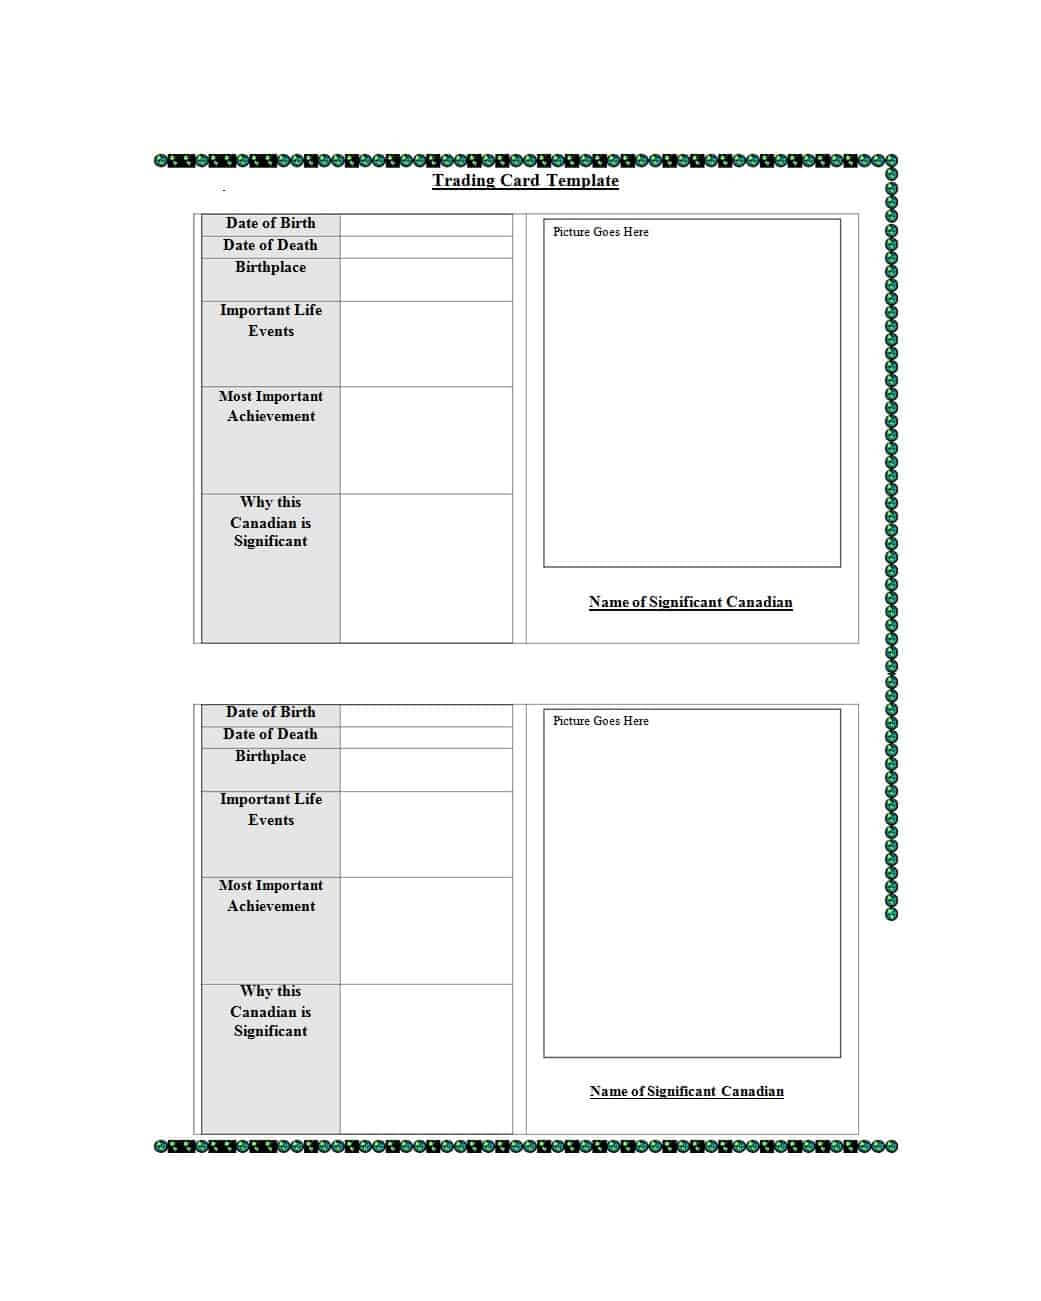 33 Free Trading Card Templates (Baseball, Football, Etc Within Trading Cards Templates Free Download